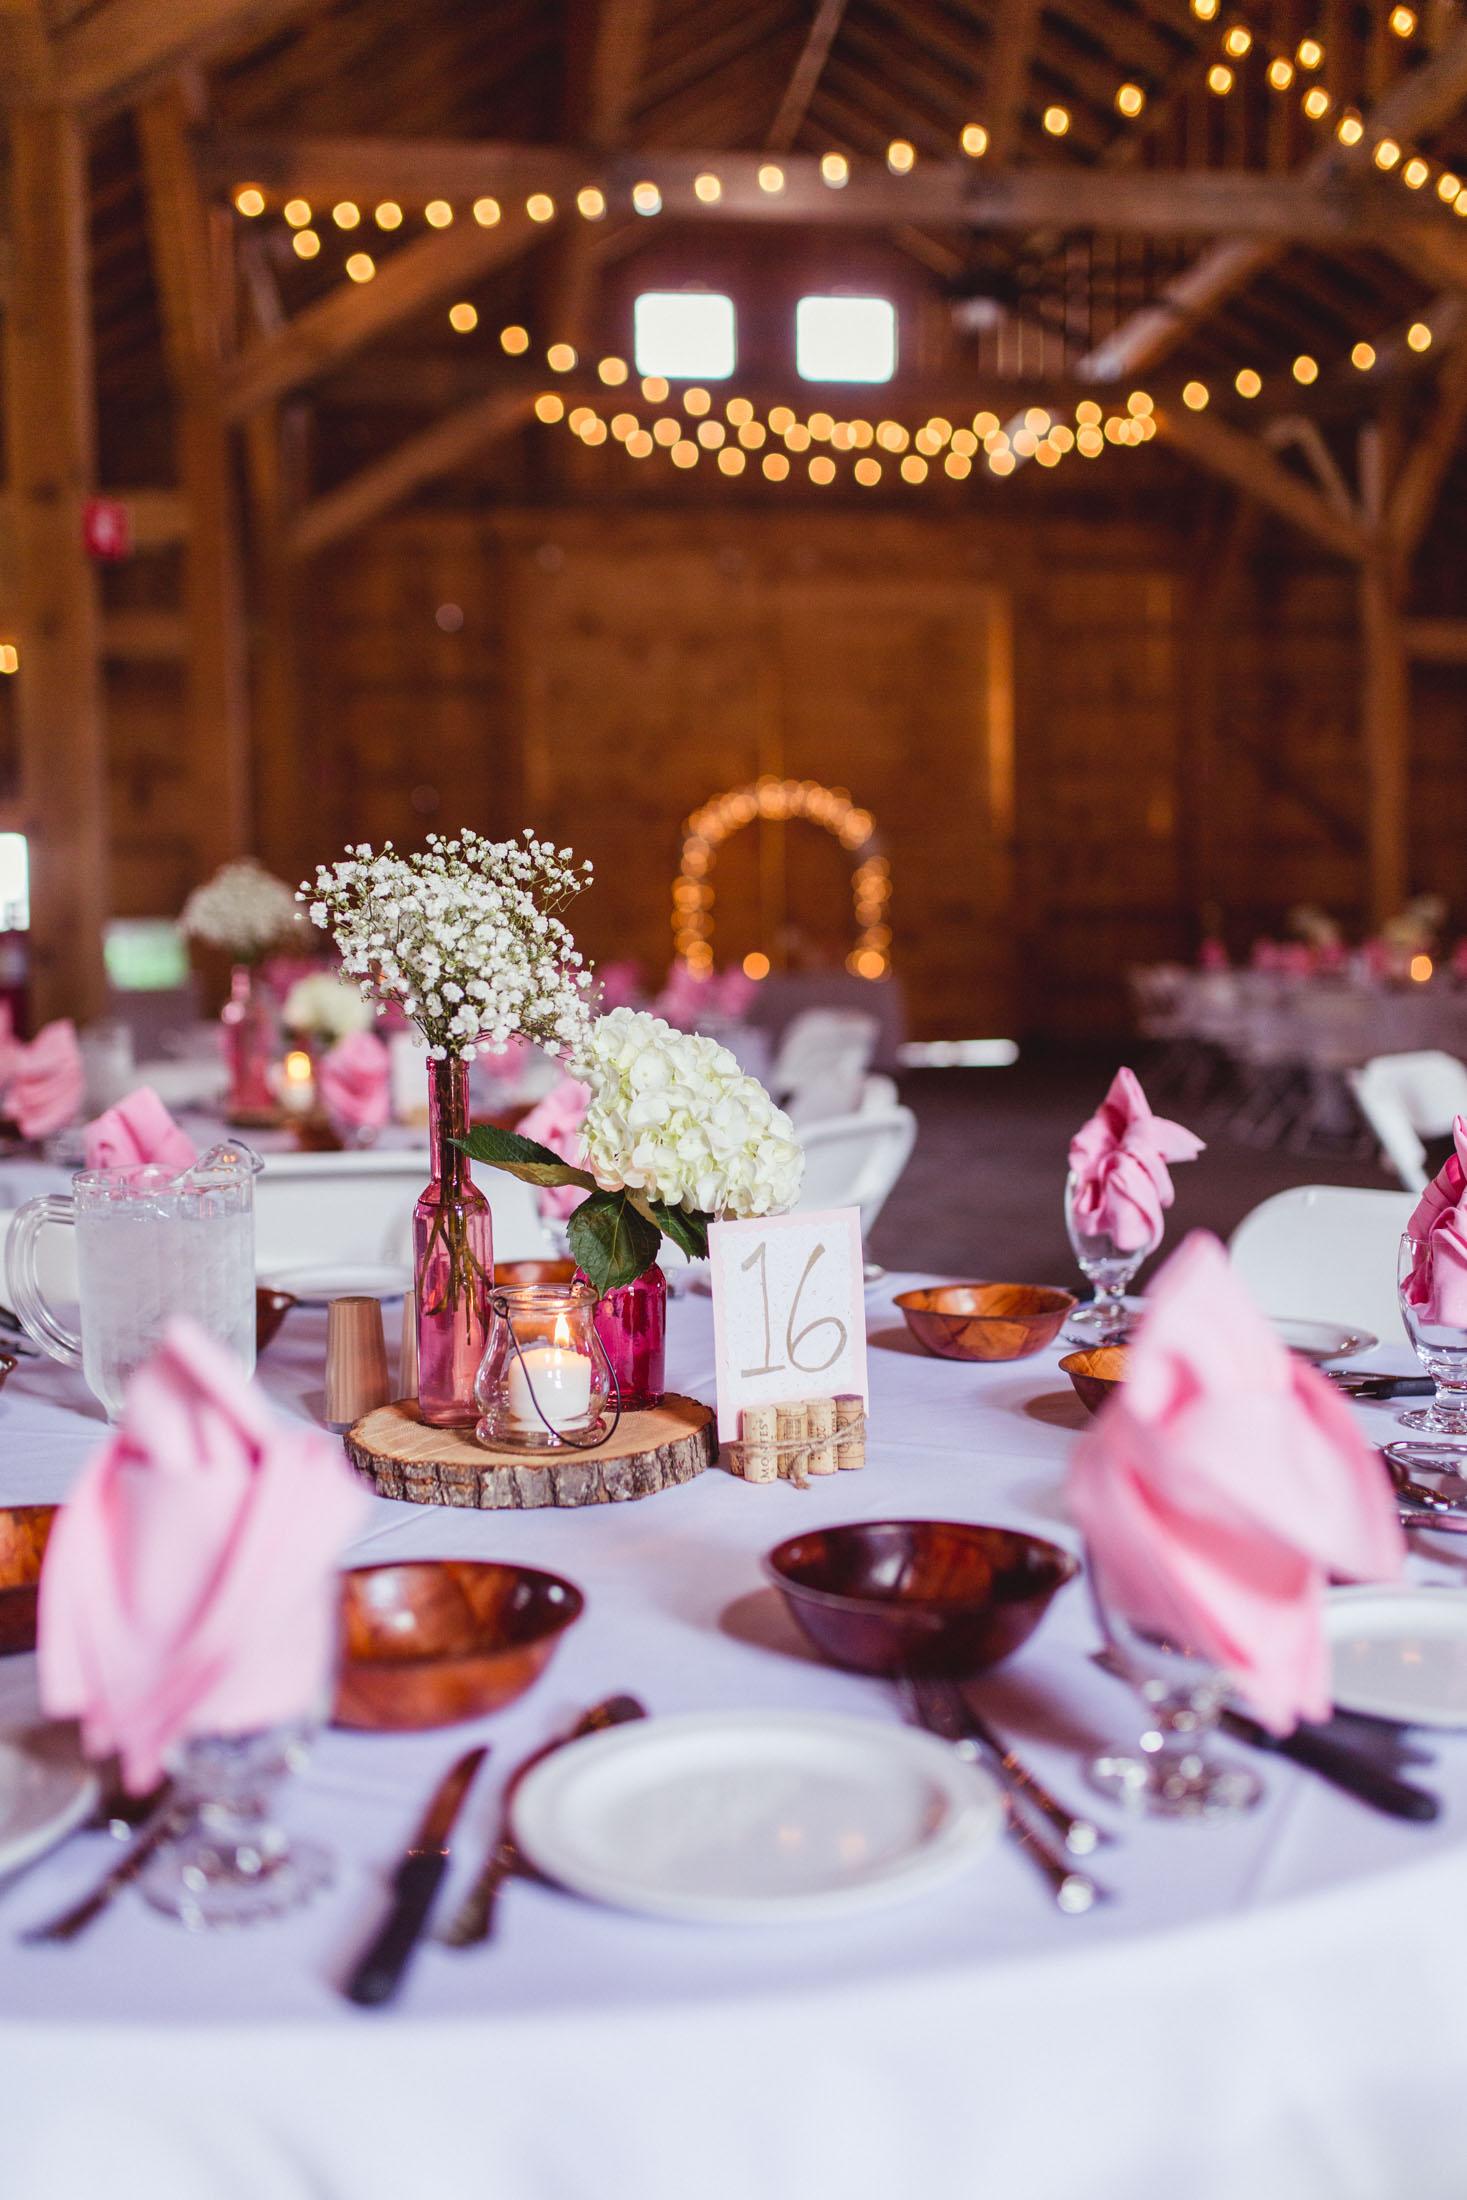 Blissful-Meadows-wedding-18.jpg